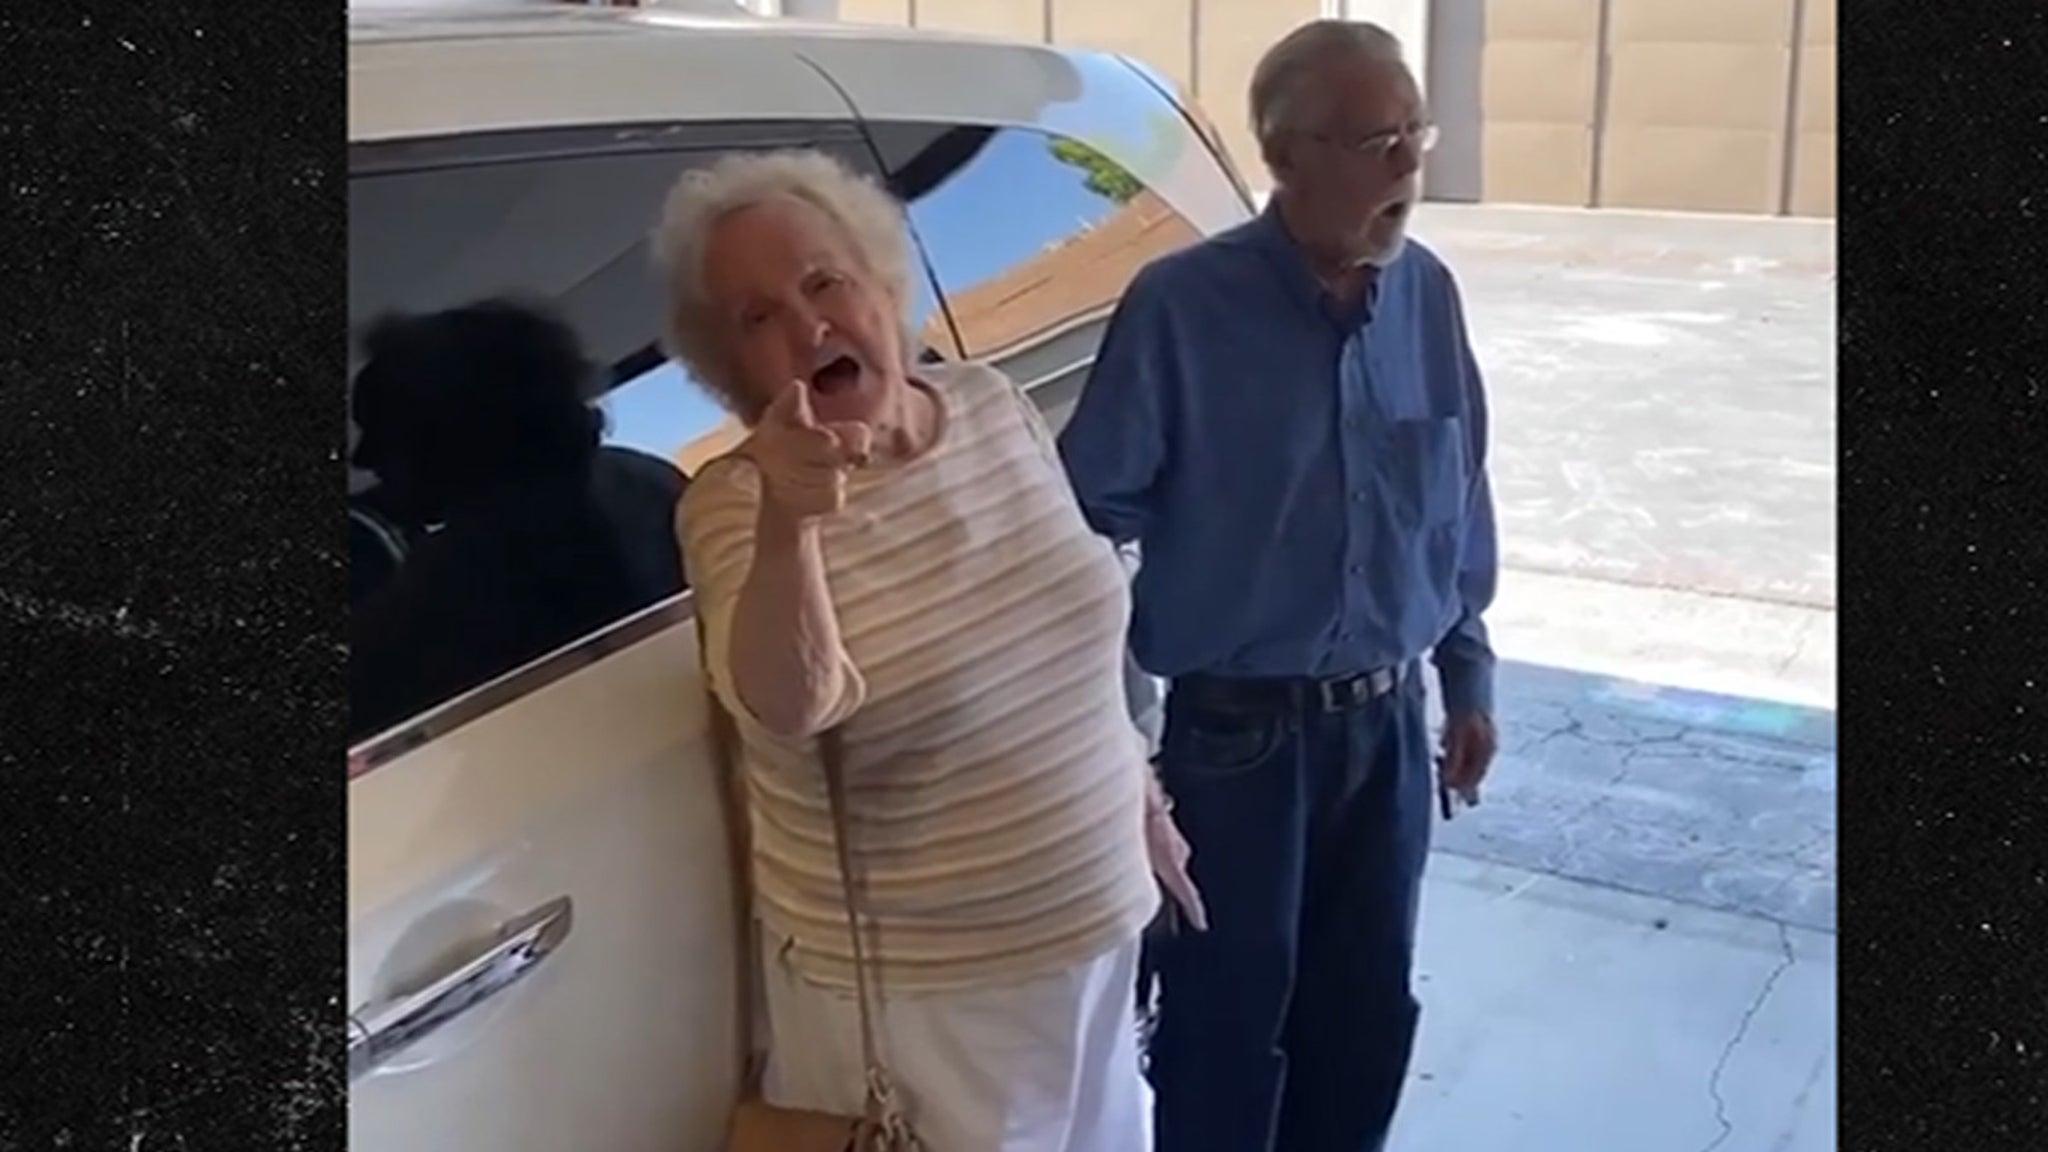 Elderly 'Karen' Freaks Out Over Kids Using Sidewalk Chalk, Drops Racist Comment